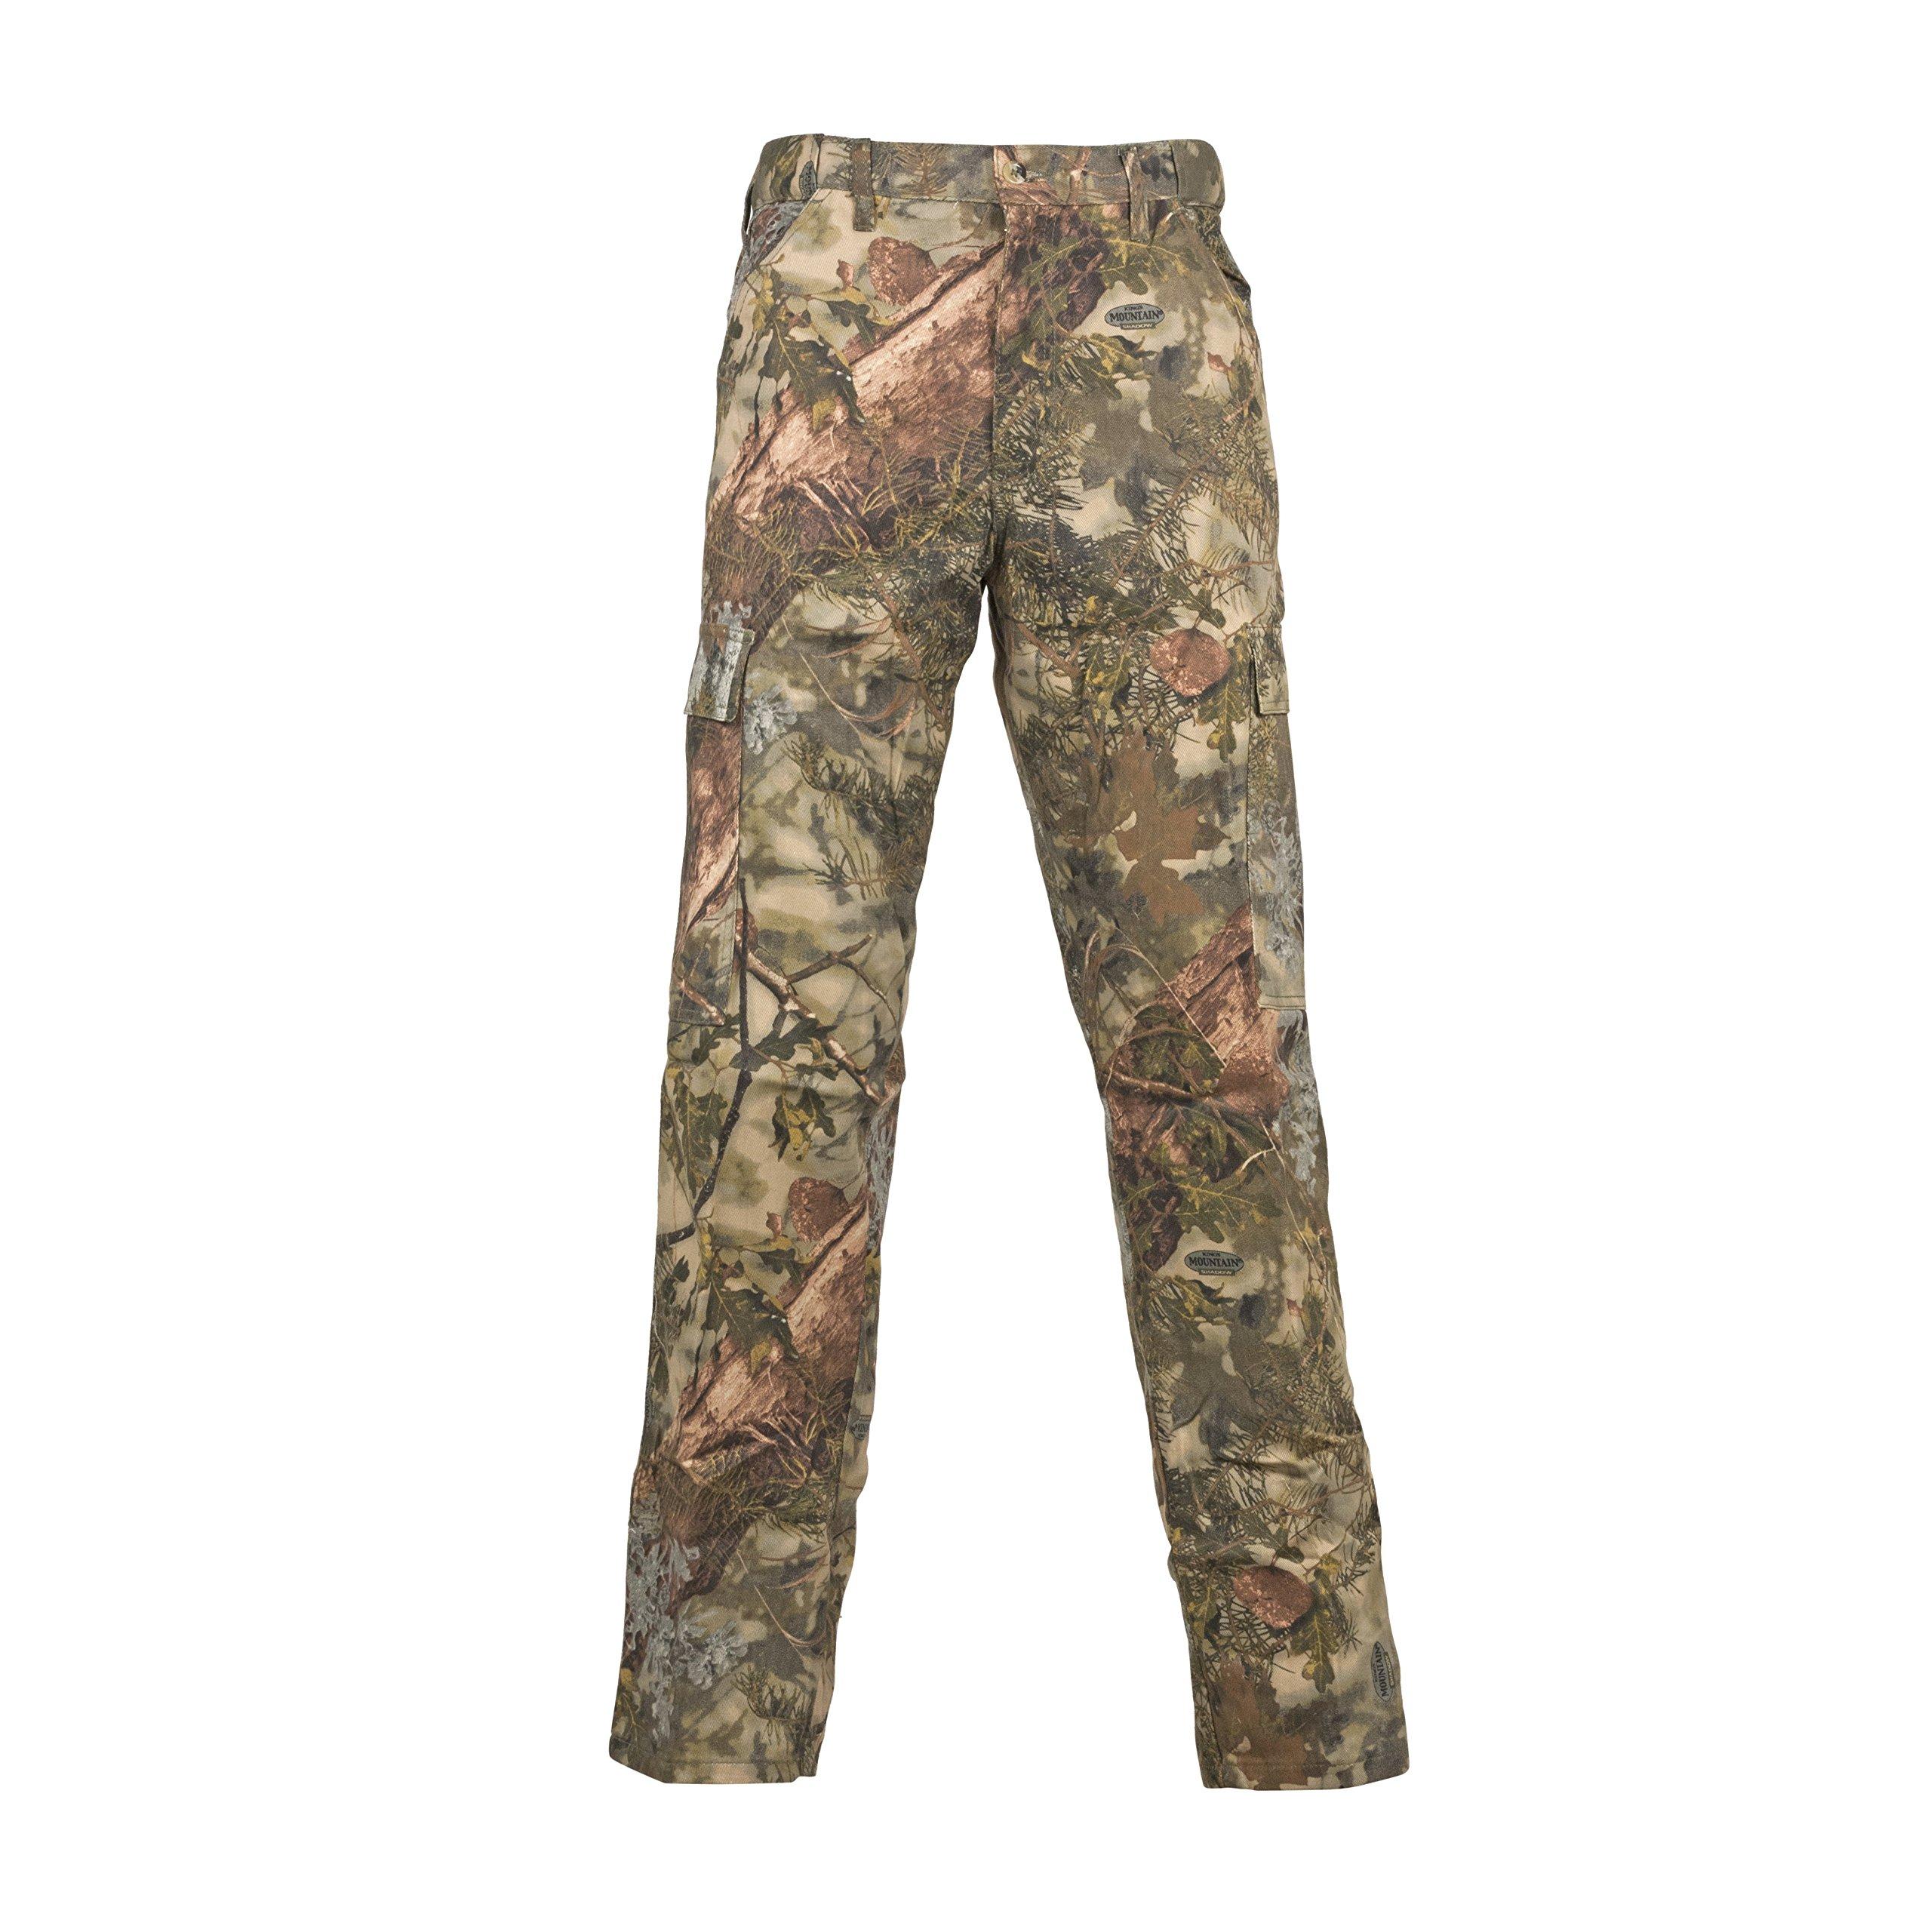 Hunting Camo Cotton Six Pocket Pants King's rxBdoeWC